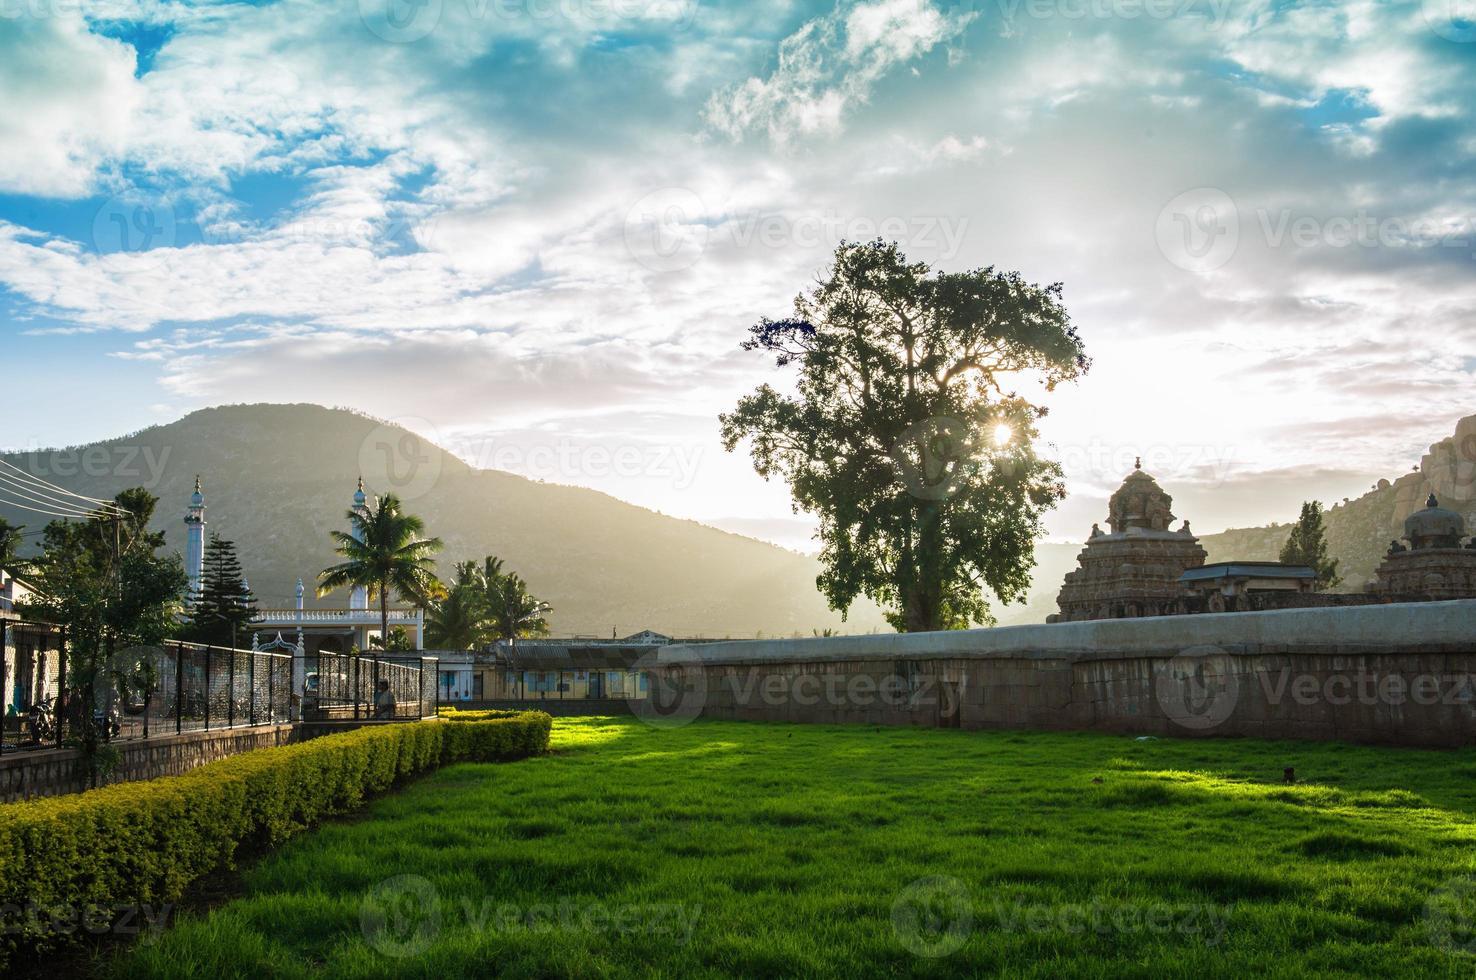 nandi dorp hindoe-tempel architectuur foto